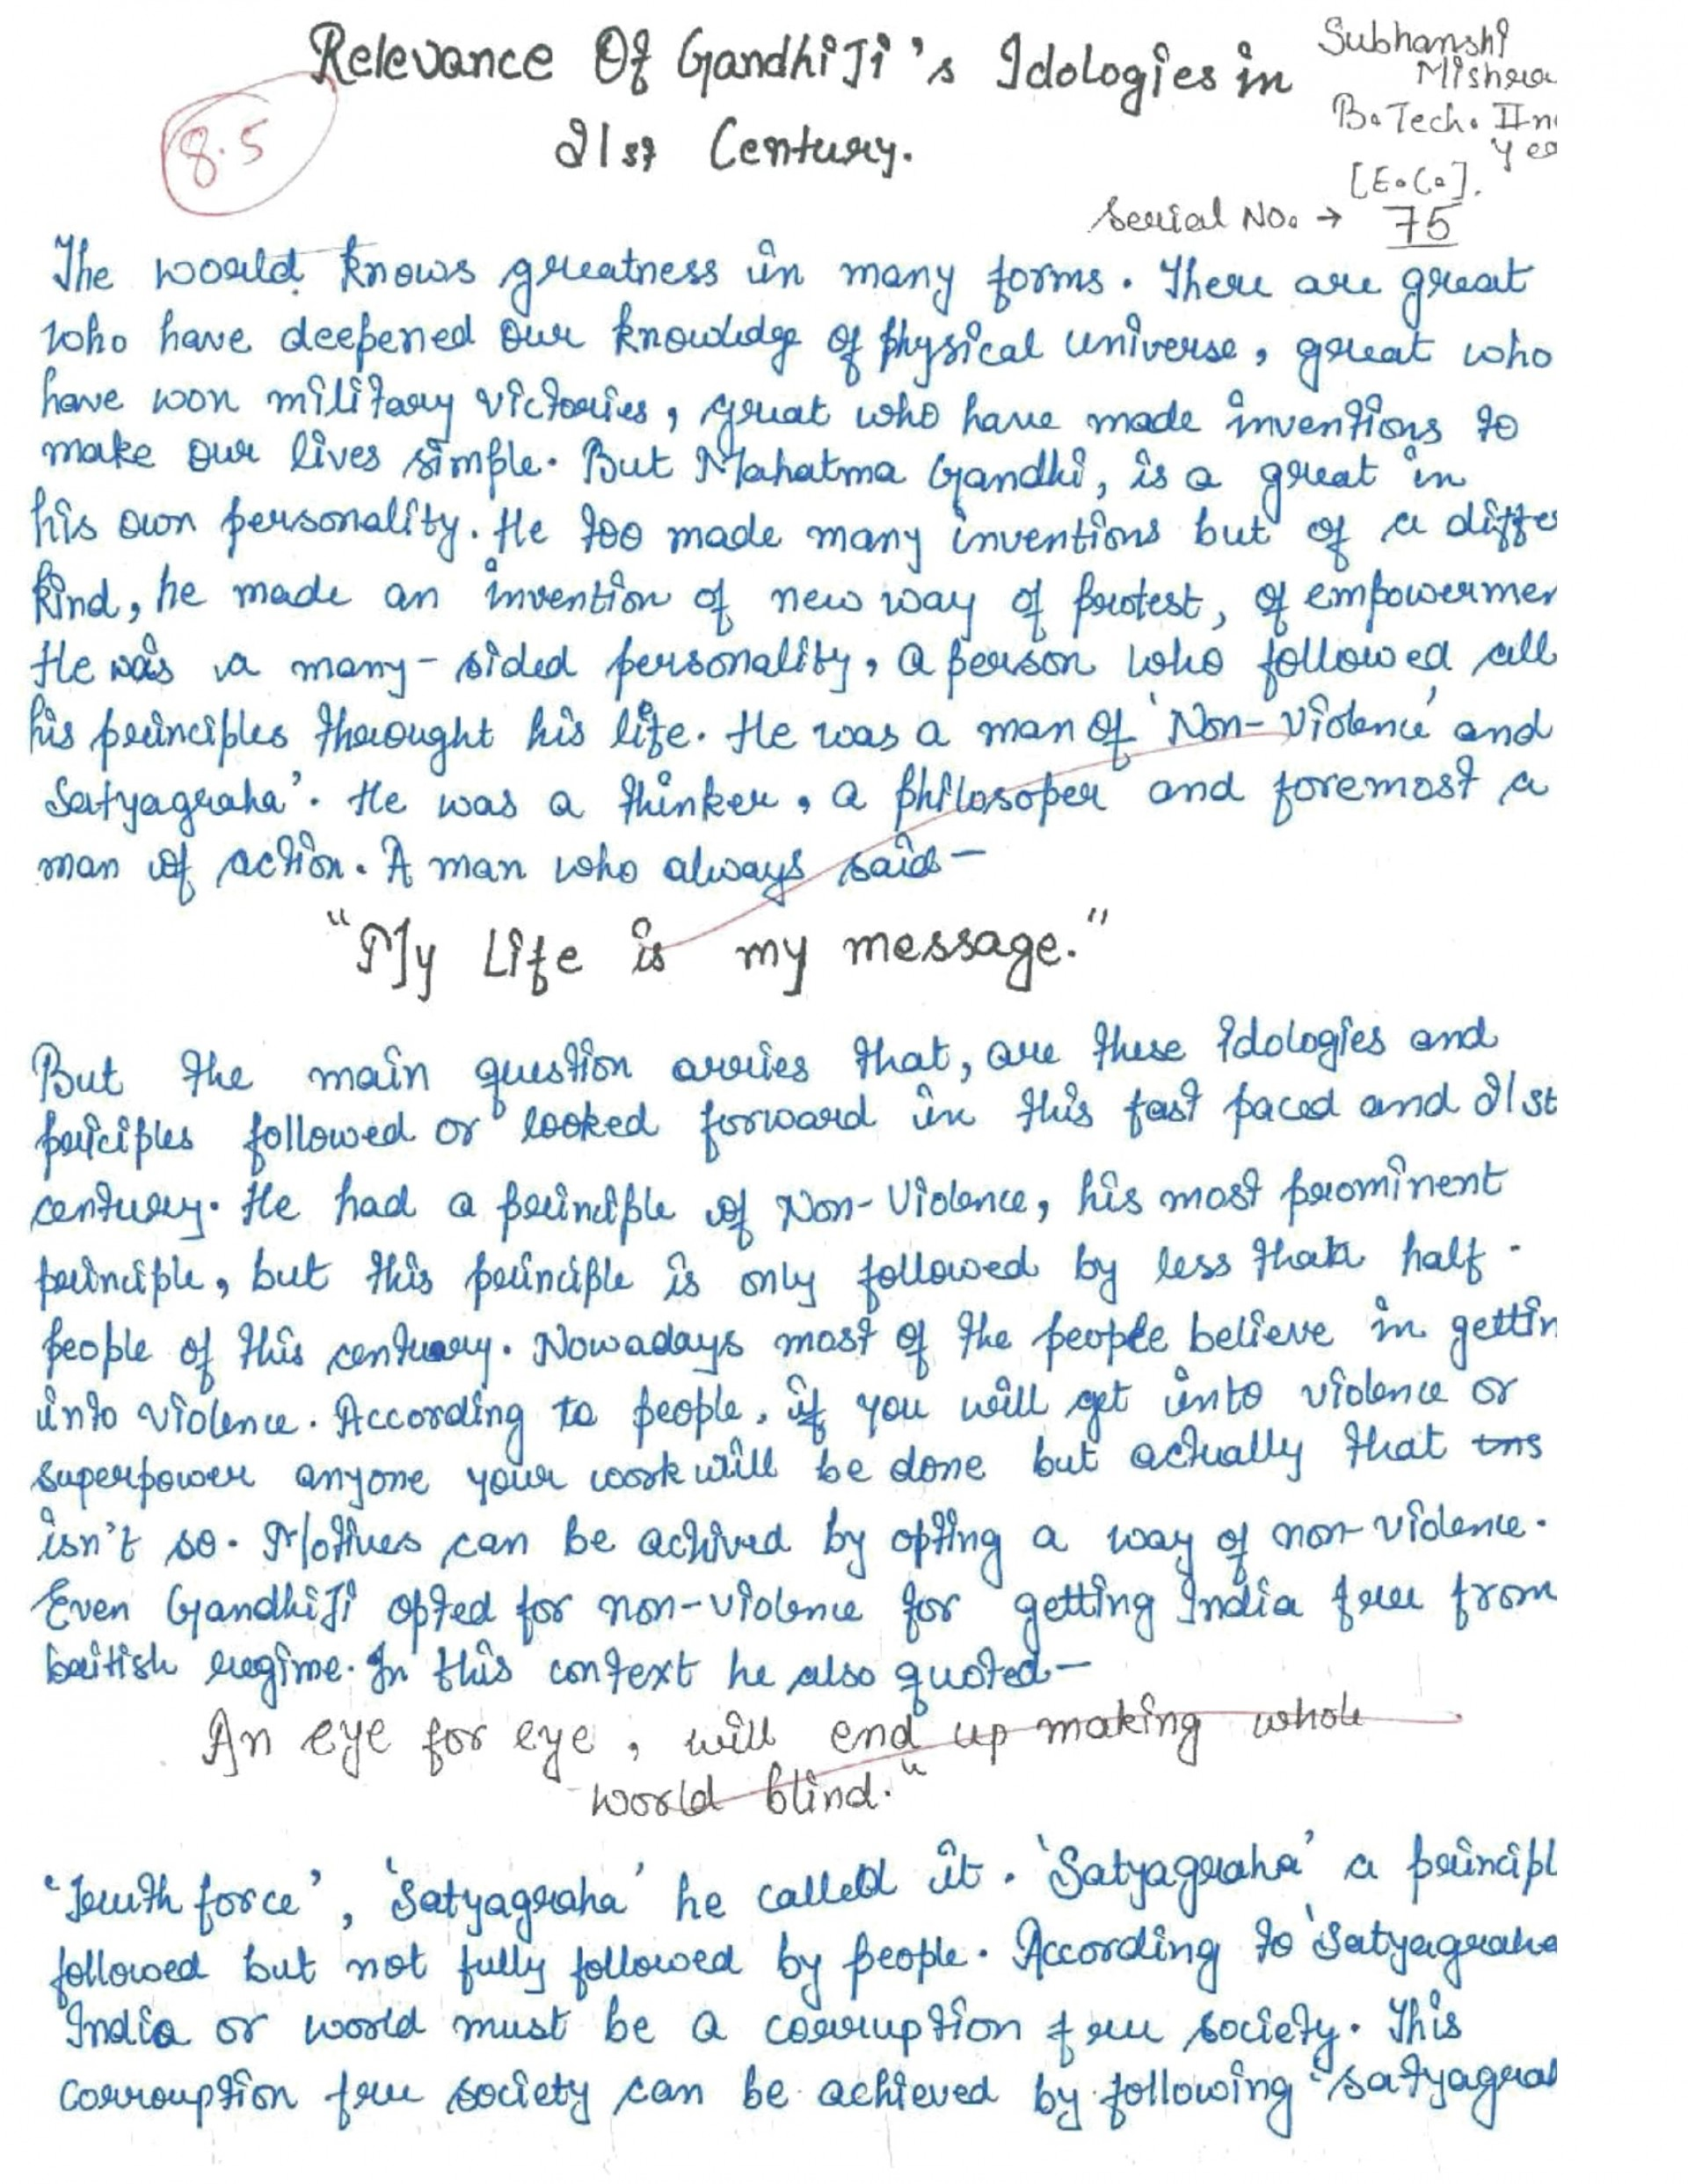 010 Essay2 Gandhiji Essay Sensational Mahatma Gandhi In Gujarati Pdf Free Download Hindi Language Ma Nibandh 1920